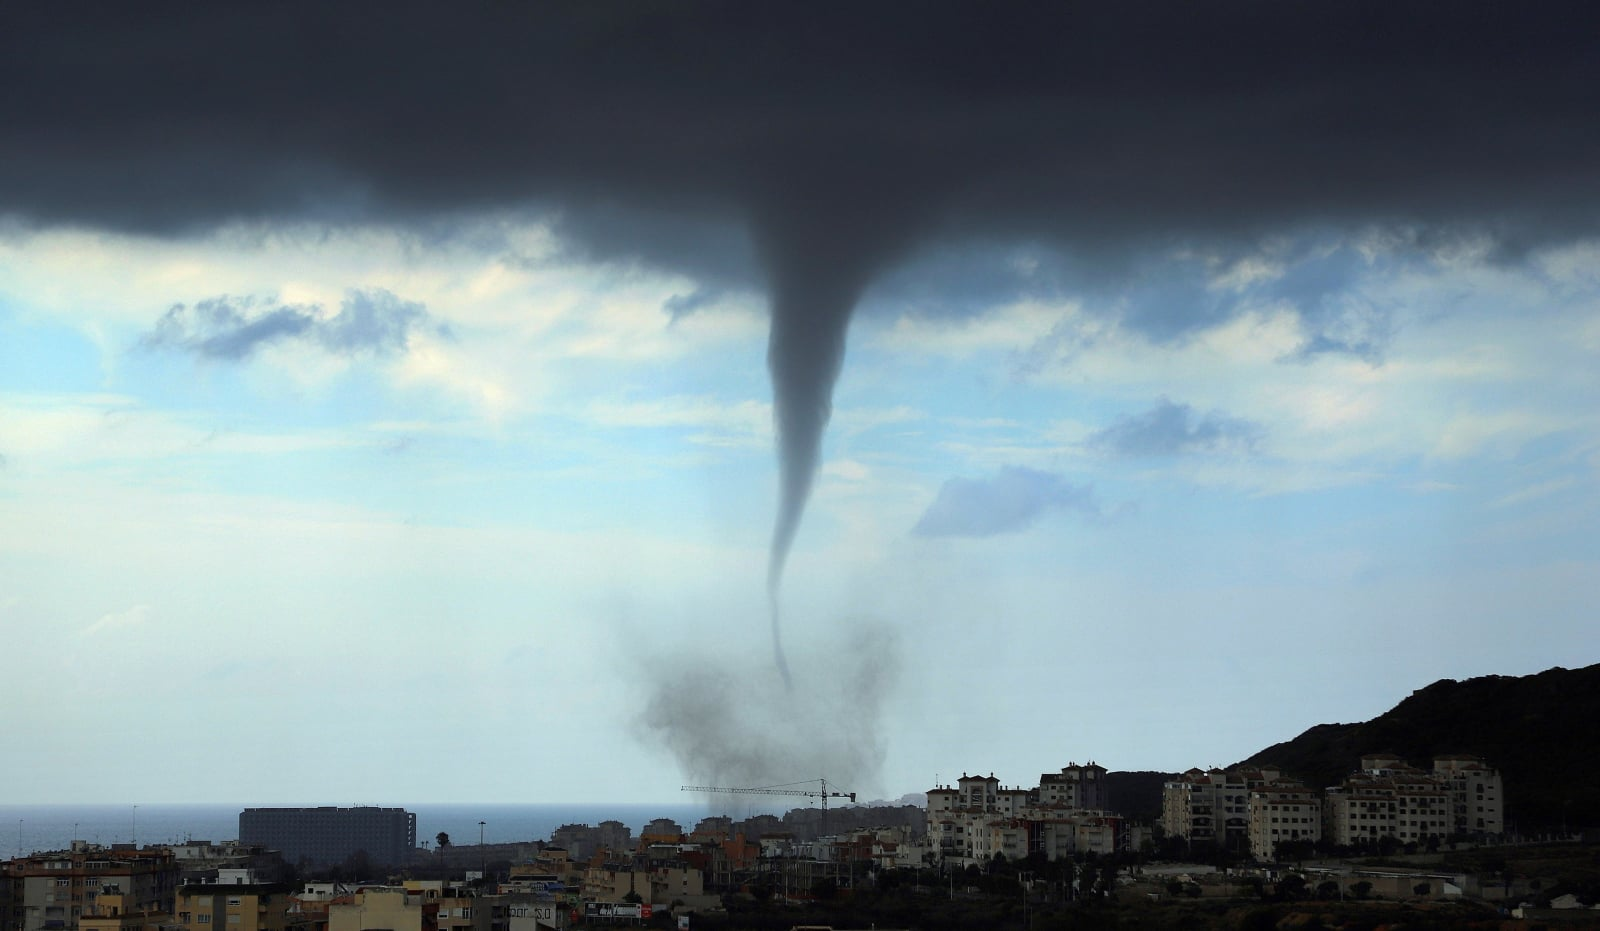 Trąba powietrzna w Alicante, Hiszpania. Fot. PAP/EPA/PEDRO GRIMAO